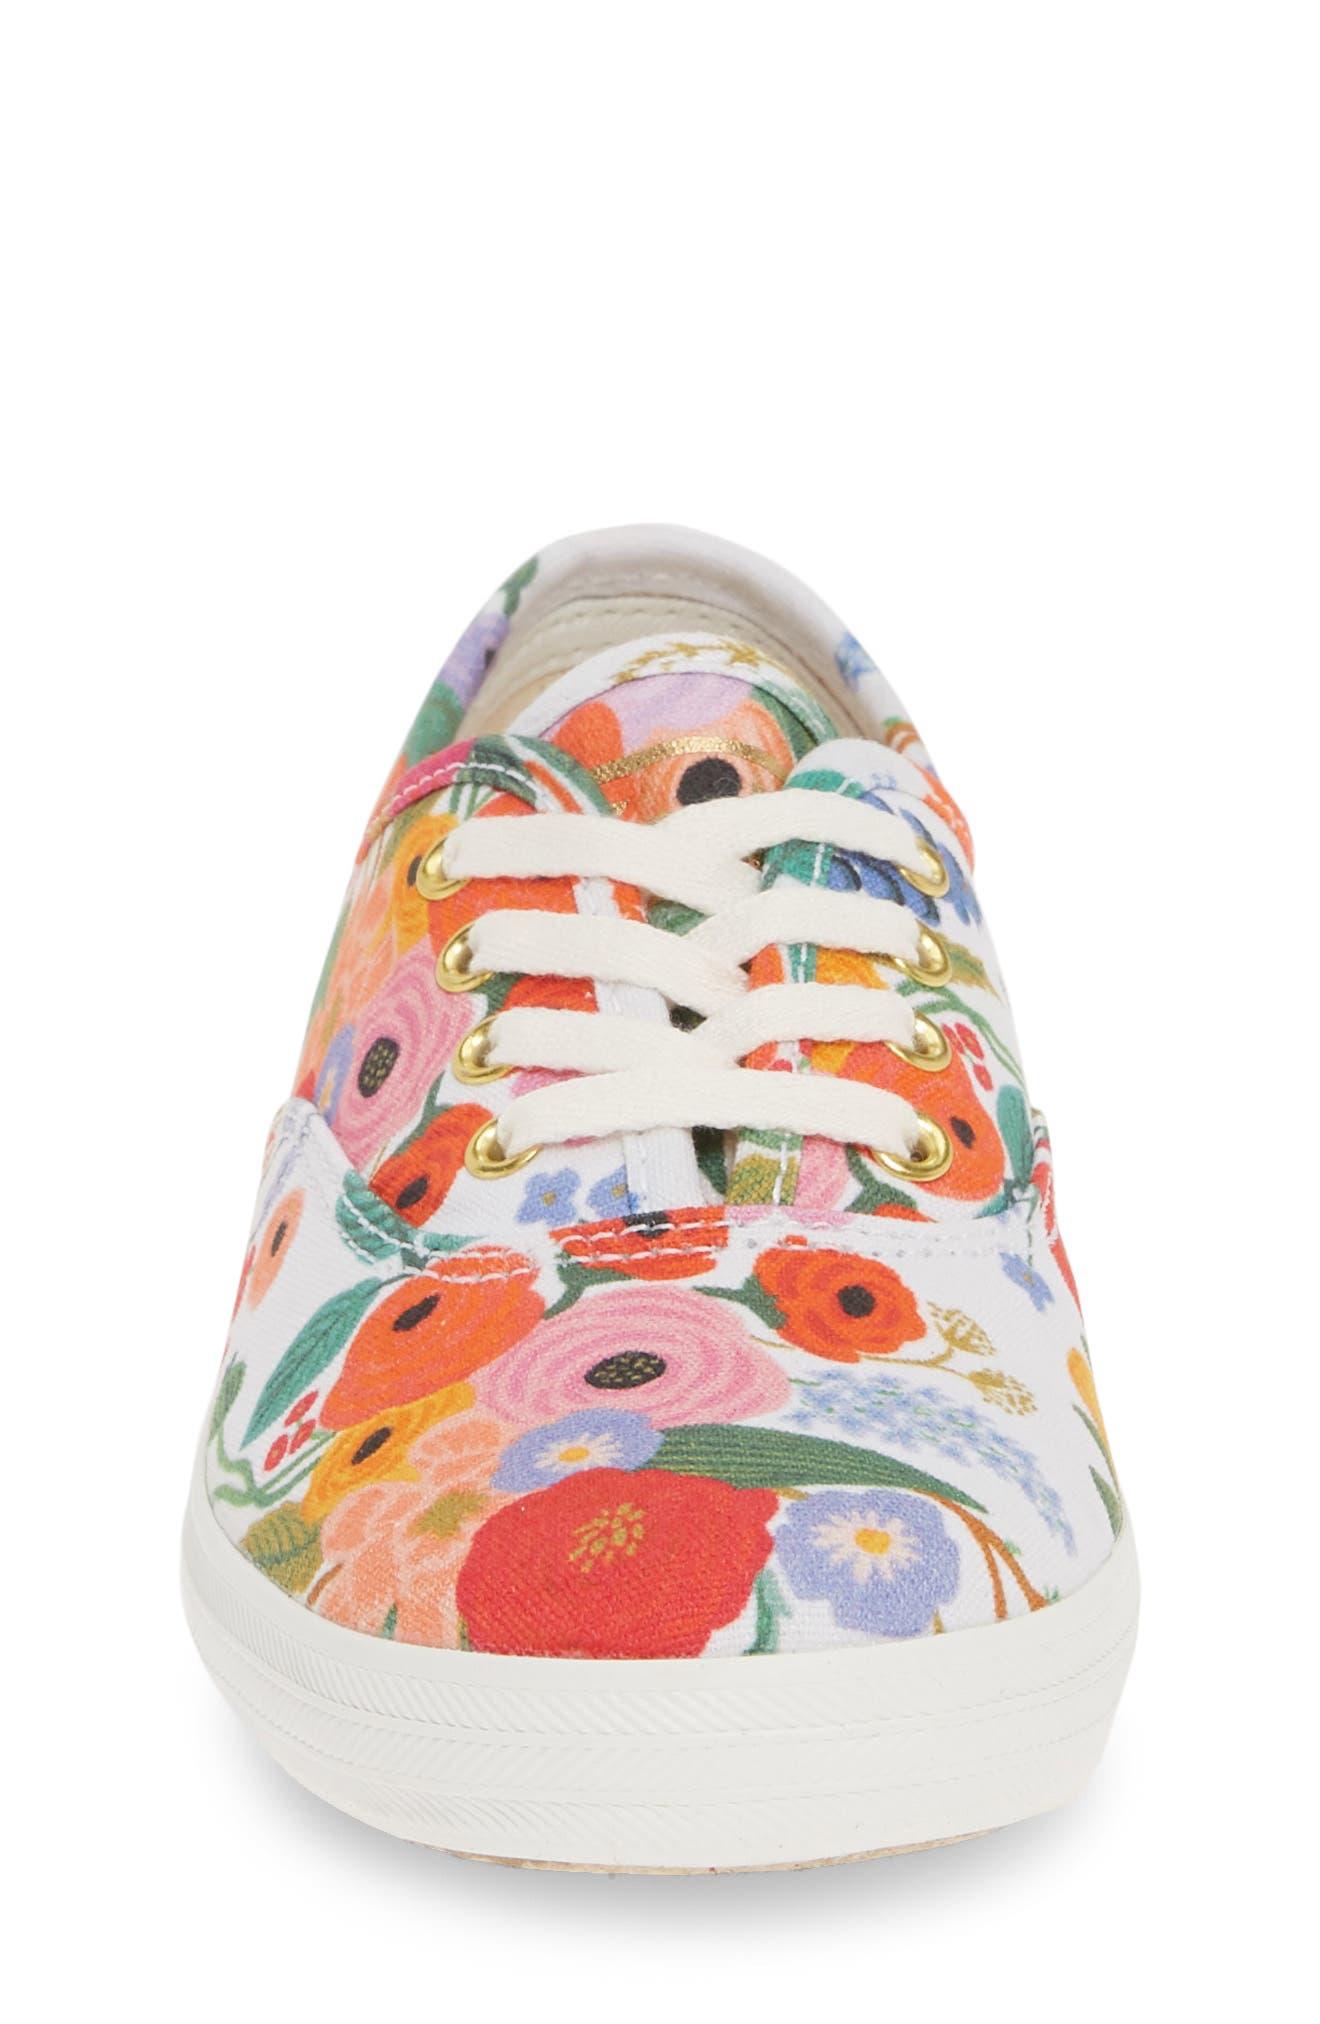 KEDS<SUP>®</SUP>, x Rifle Paper Co. Floral Print Champion Sneaker, Alternate thumbnail 4, color, GARDEN PARTY